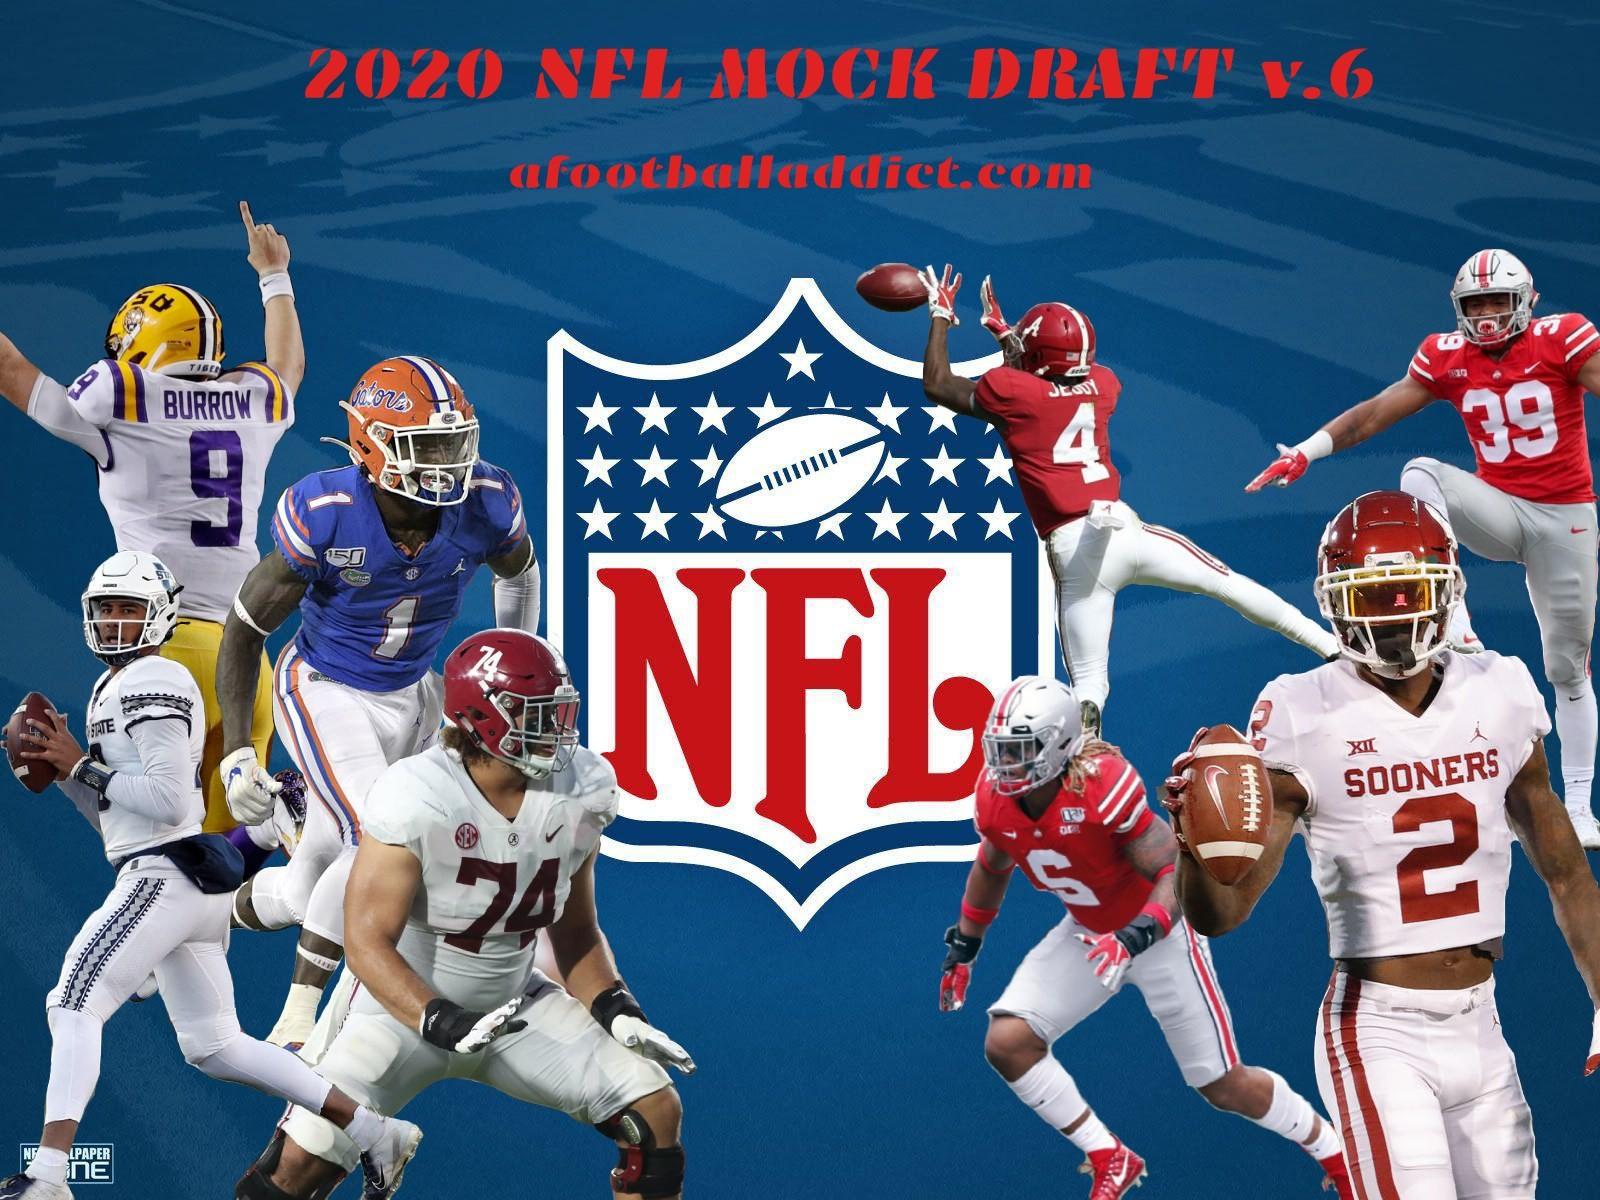 2020 NFL Mock Draft v.6